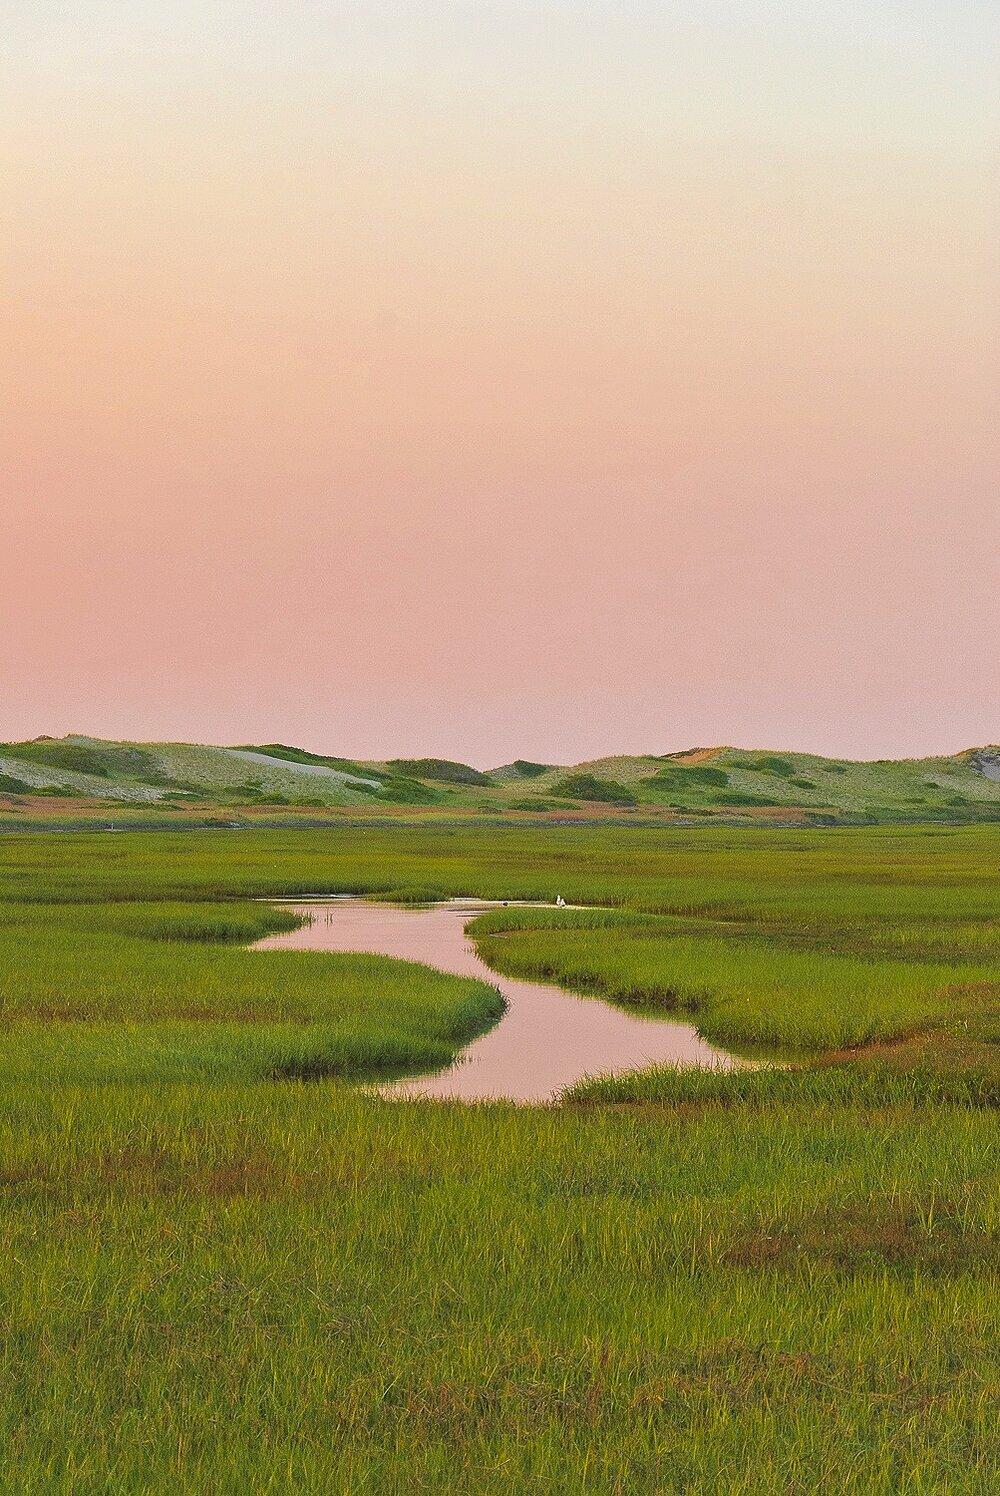 Cape Cod Evening Light - Cape Cod National Seashore, Massachusetts